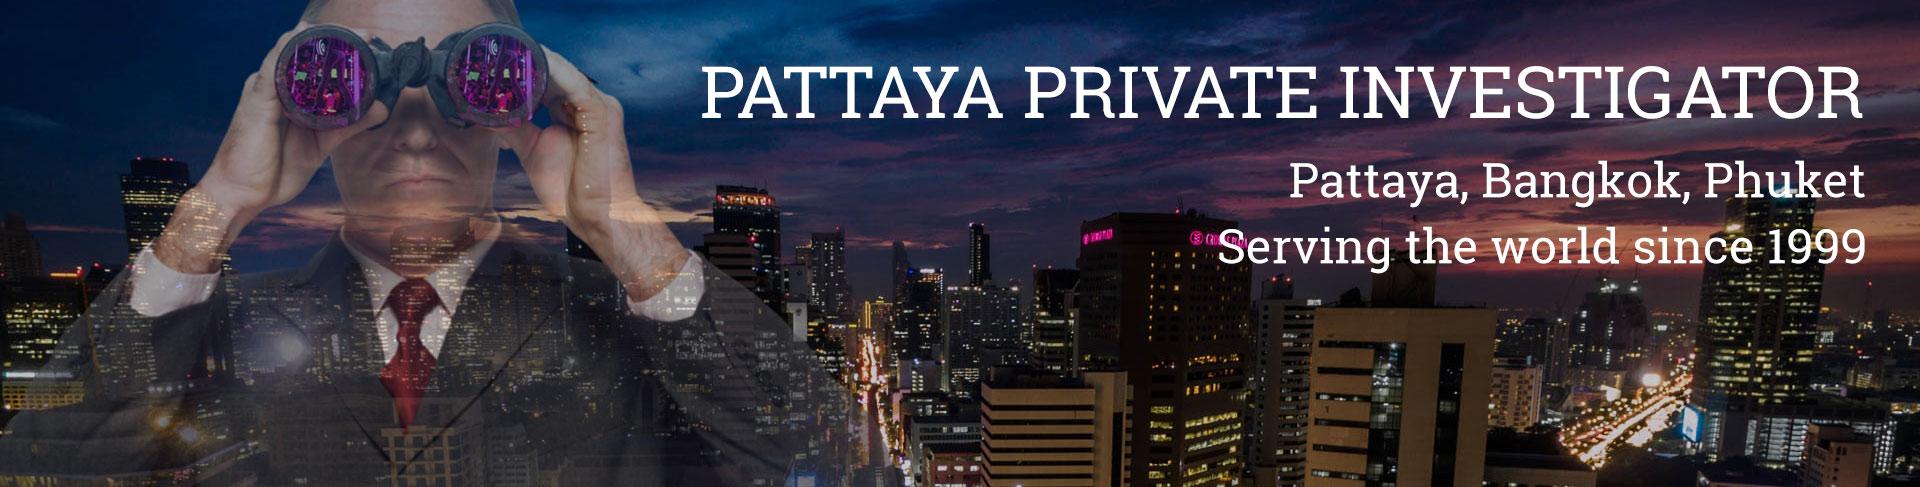 Pattaya Private Investigator